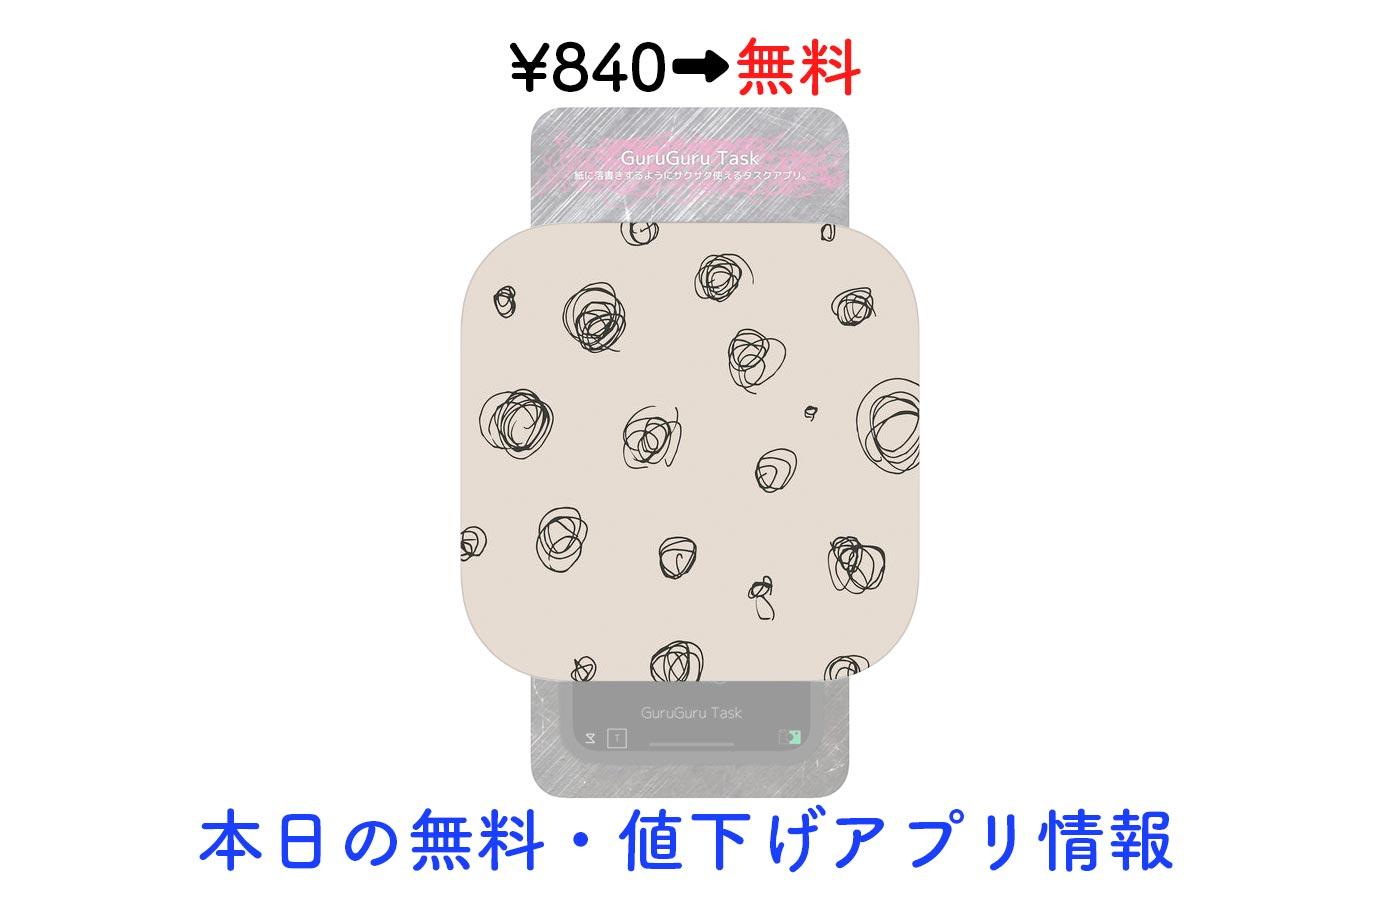 Appsale0520